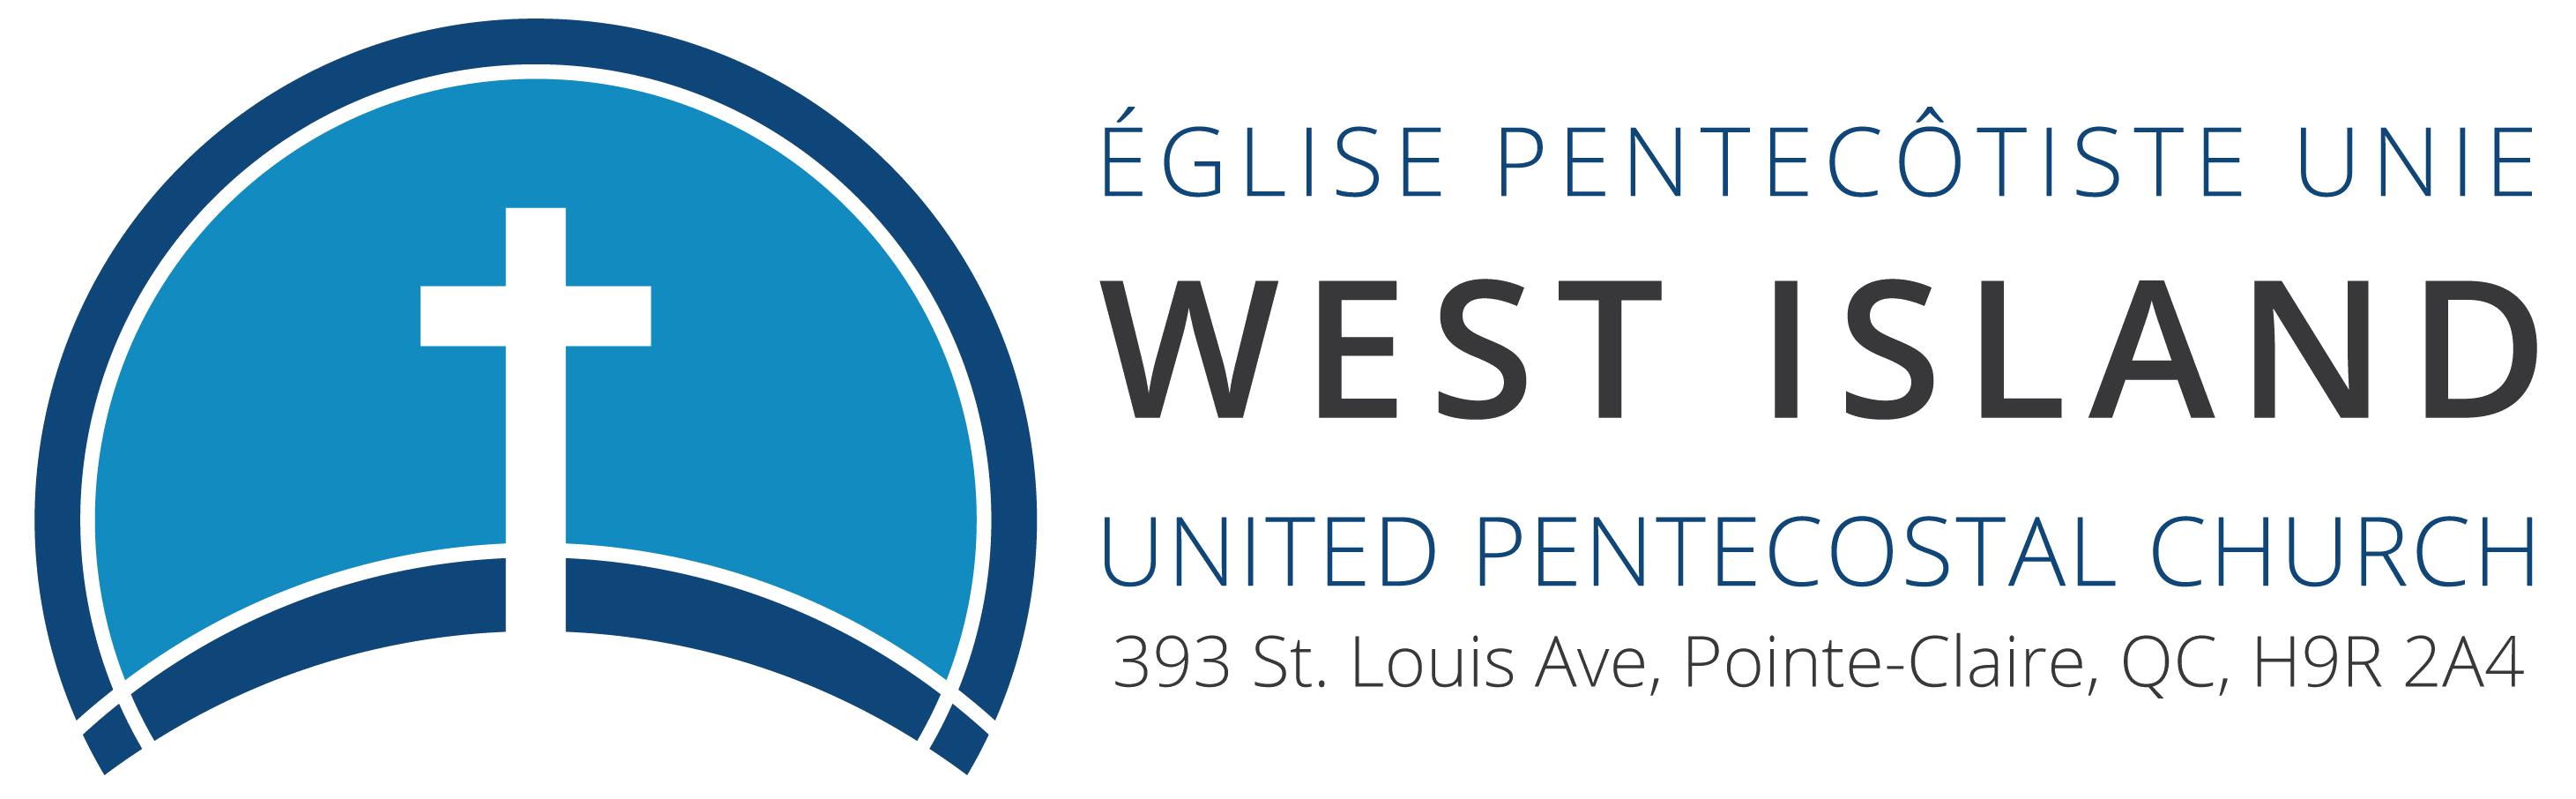 West Island United Pentecostal Church